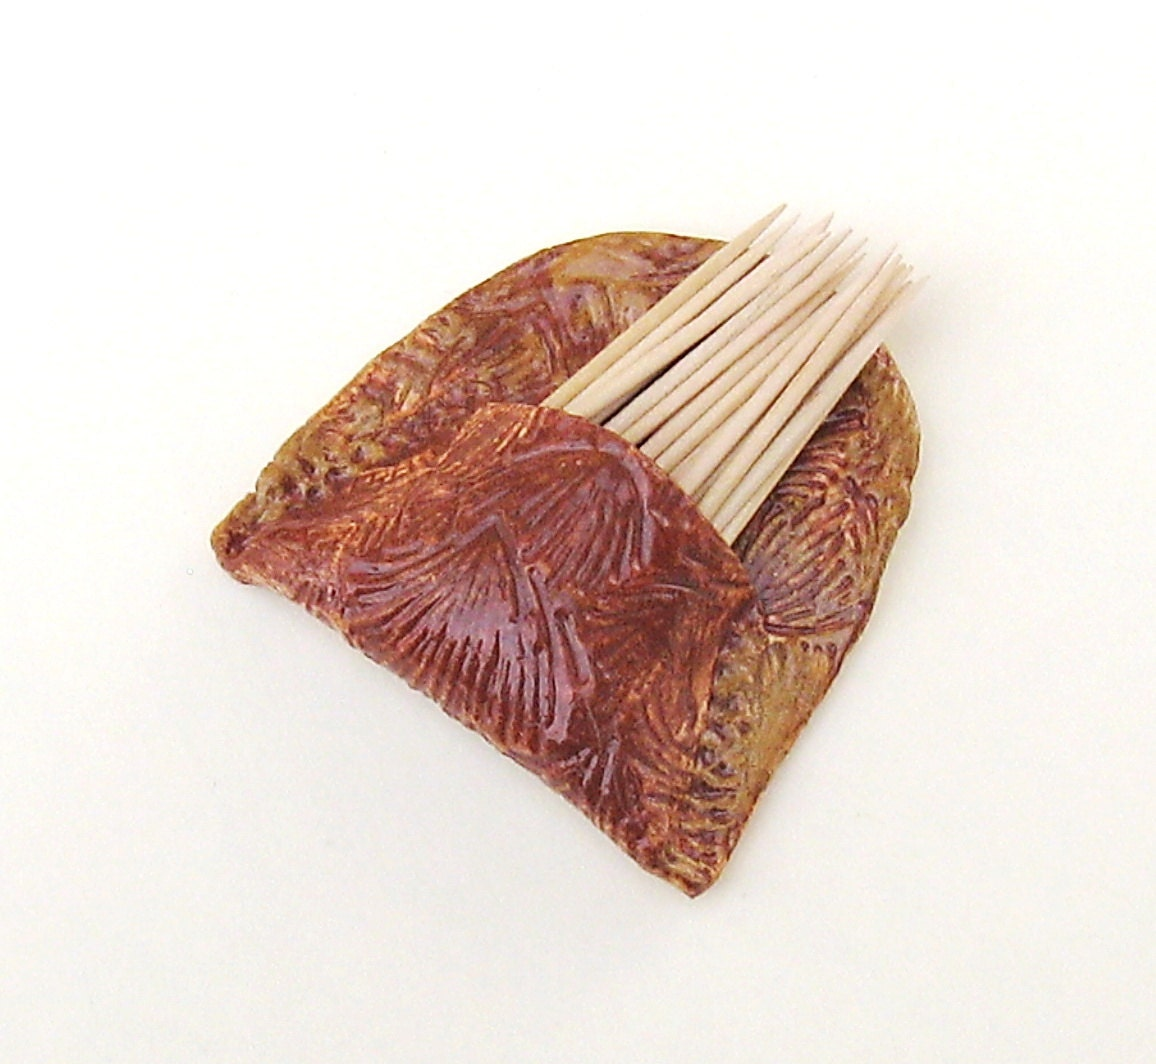 Toothpick holder ceramic wall pocket pottery vase kitchen - Toothpick holder pocket ...